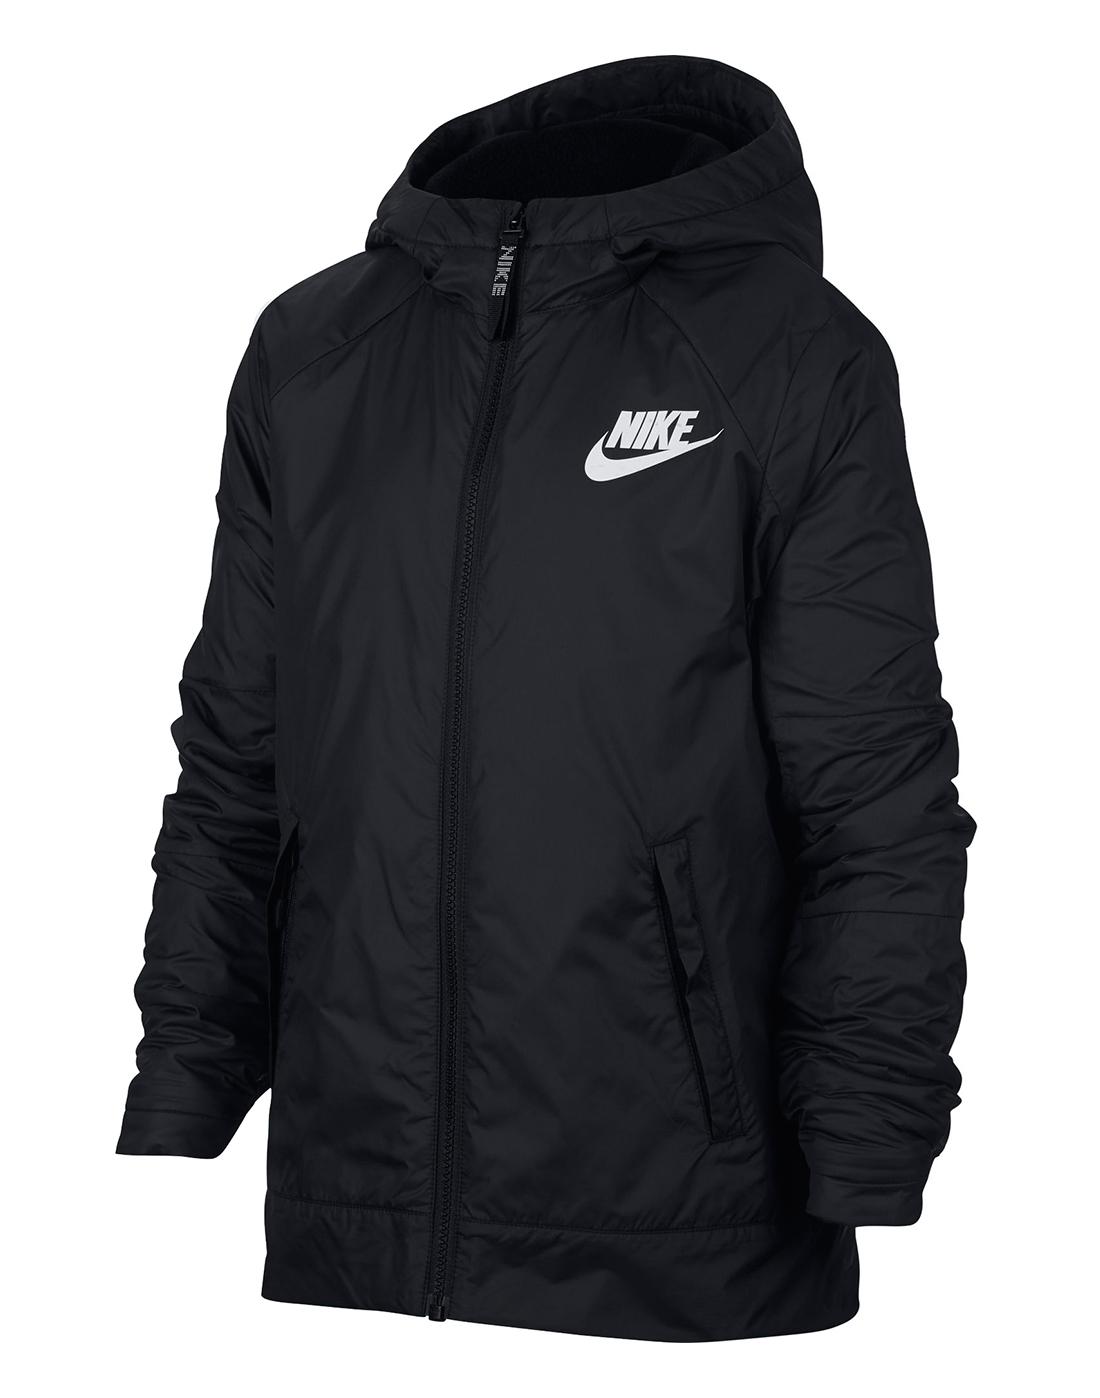 9d17c5dd91 Nike Older Boys Fleece Lined Jacket   Life Style Sports